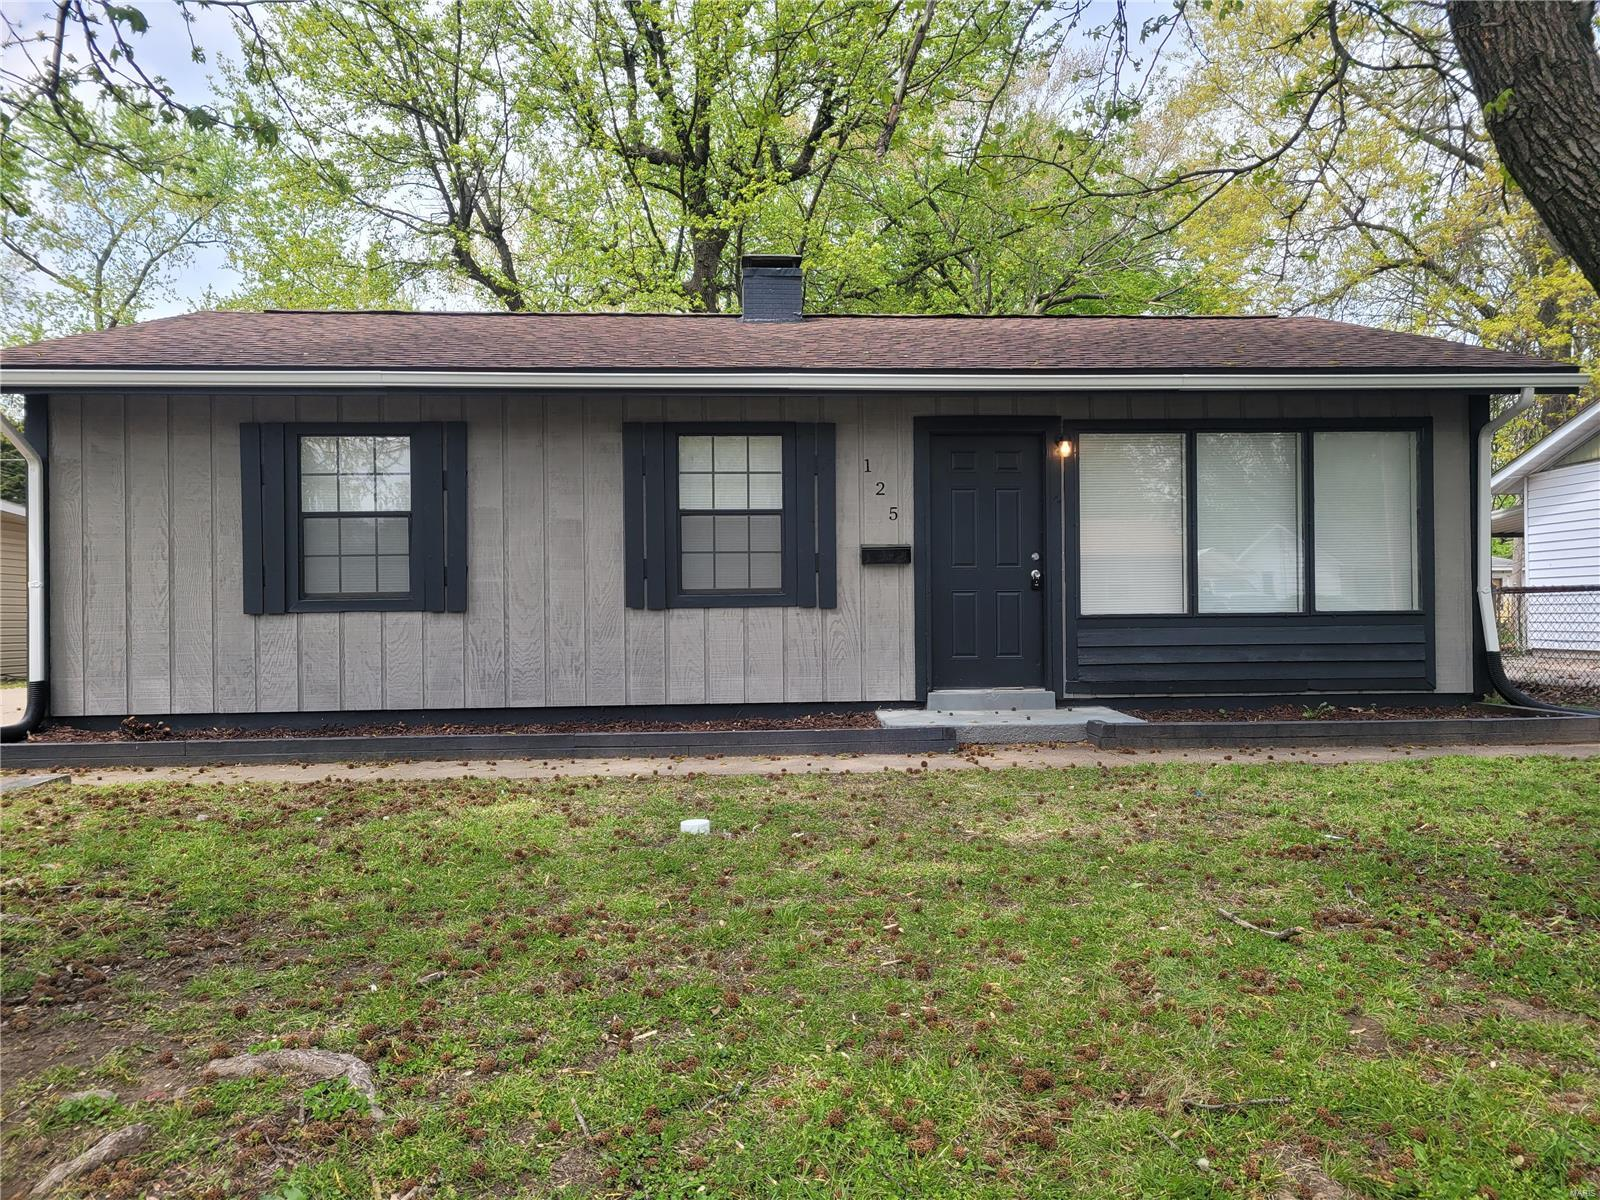 125 Saint Robert Property Photo - Cahokia, IL real estate listing